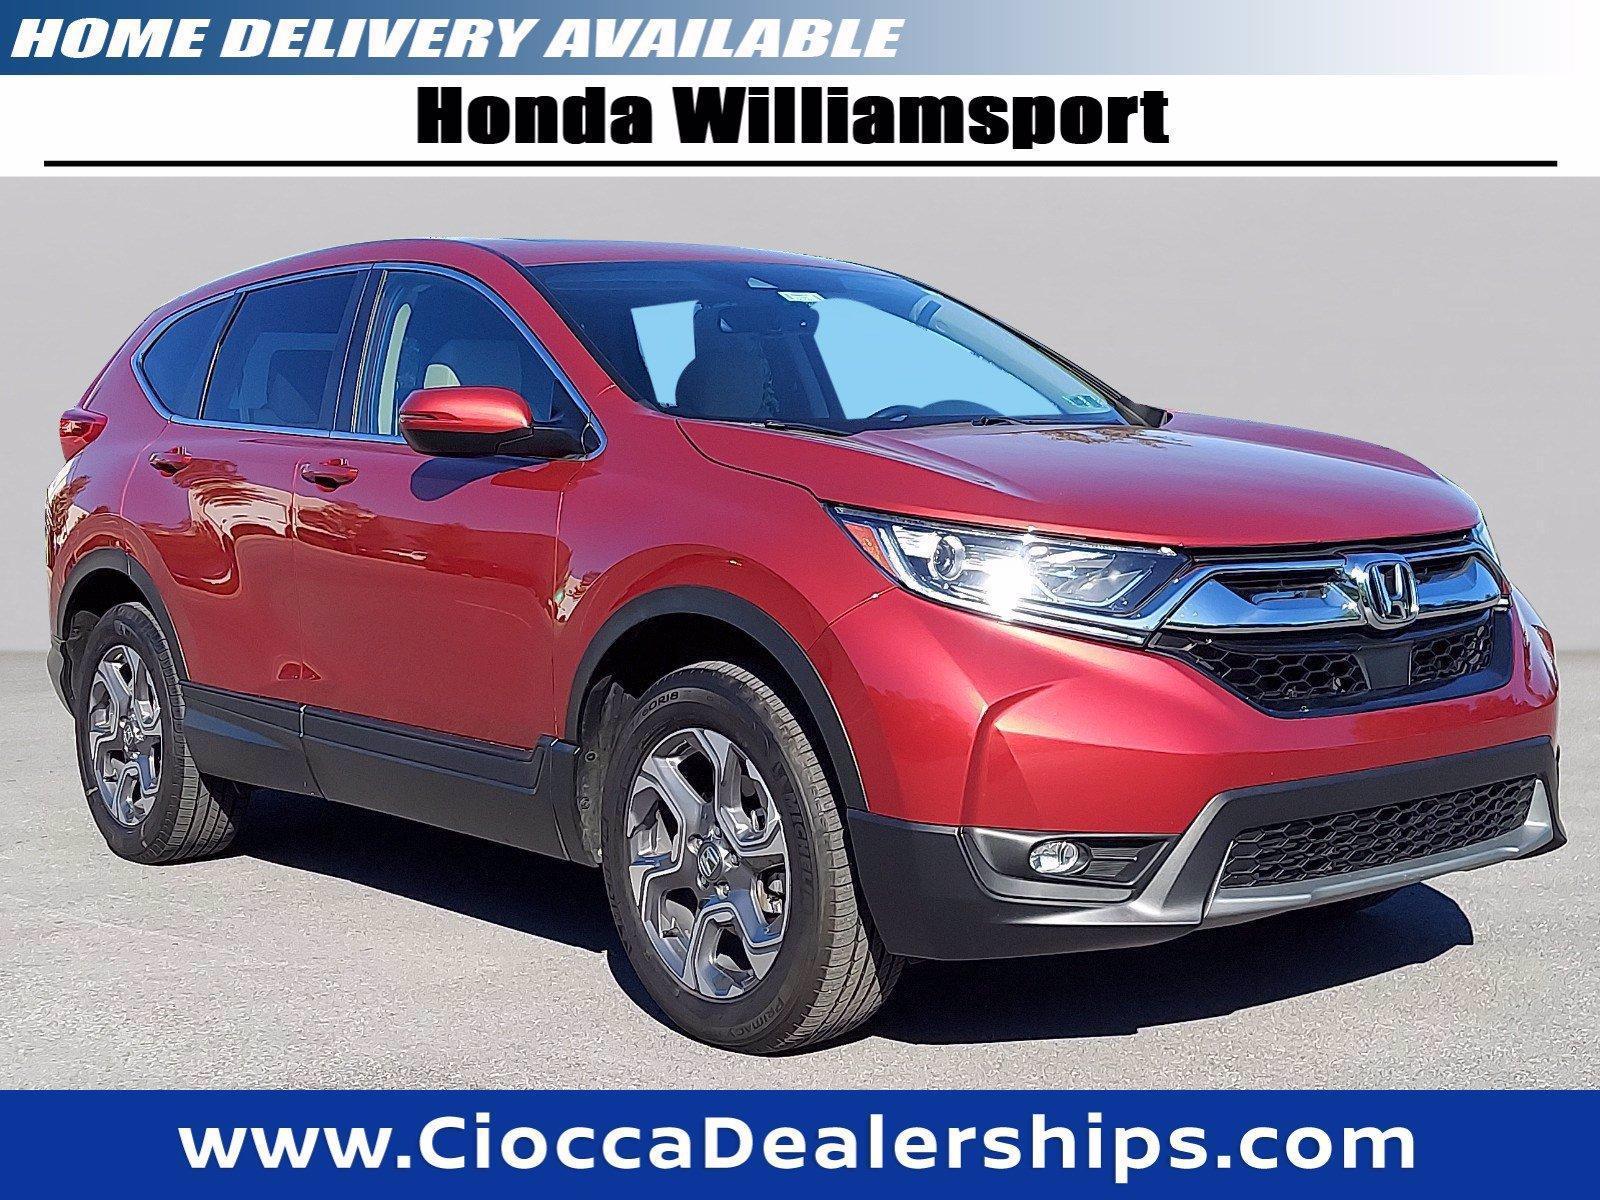 2018 Honda CR-V Vehicle Photo in Muncy, PA 17756